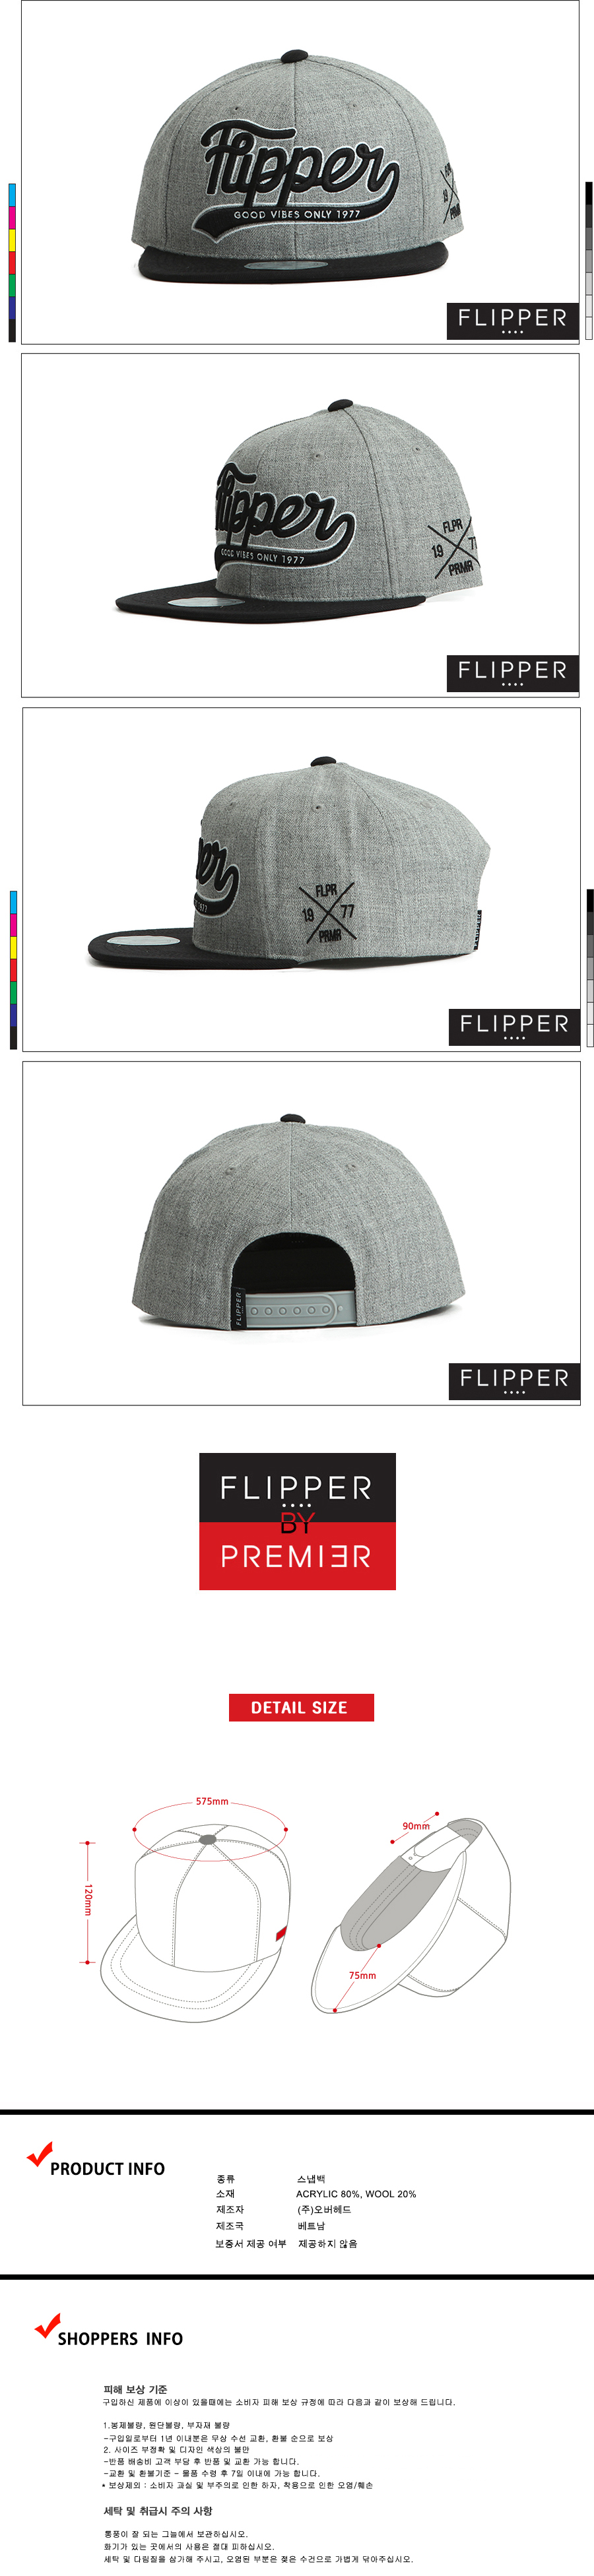 [ PREMIER ] [Premier] Flipper Snapback Cursive Logo Melange/Black (FL047)